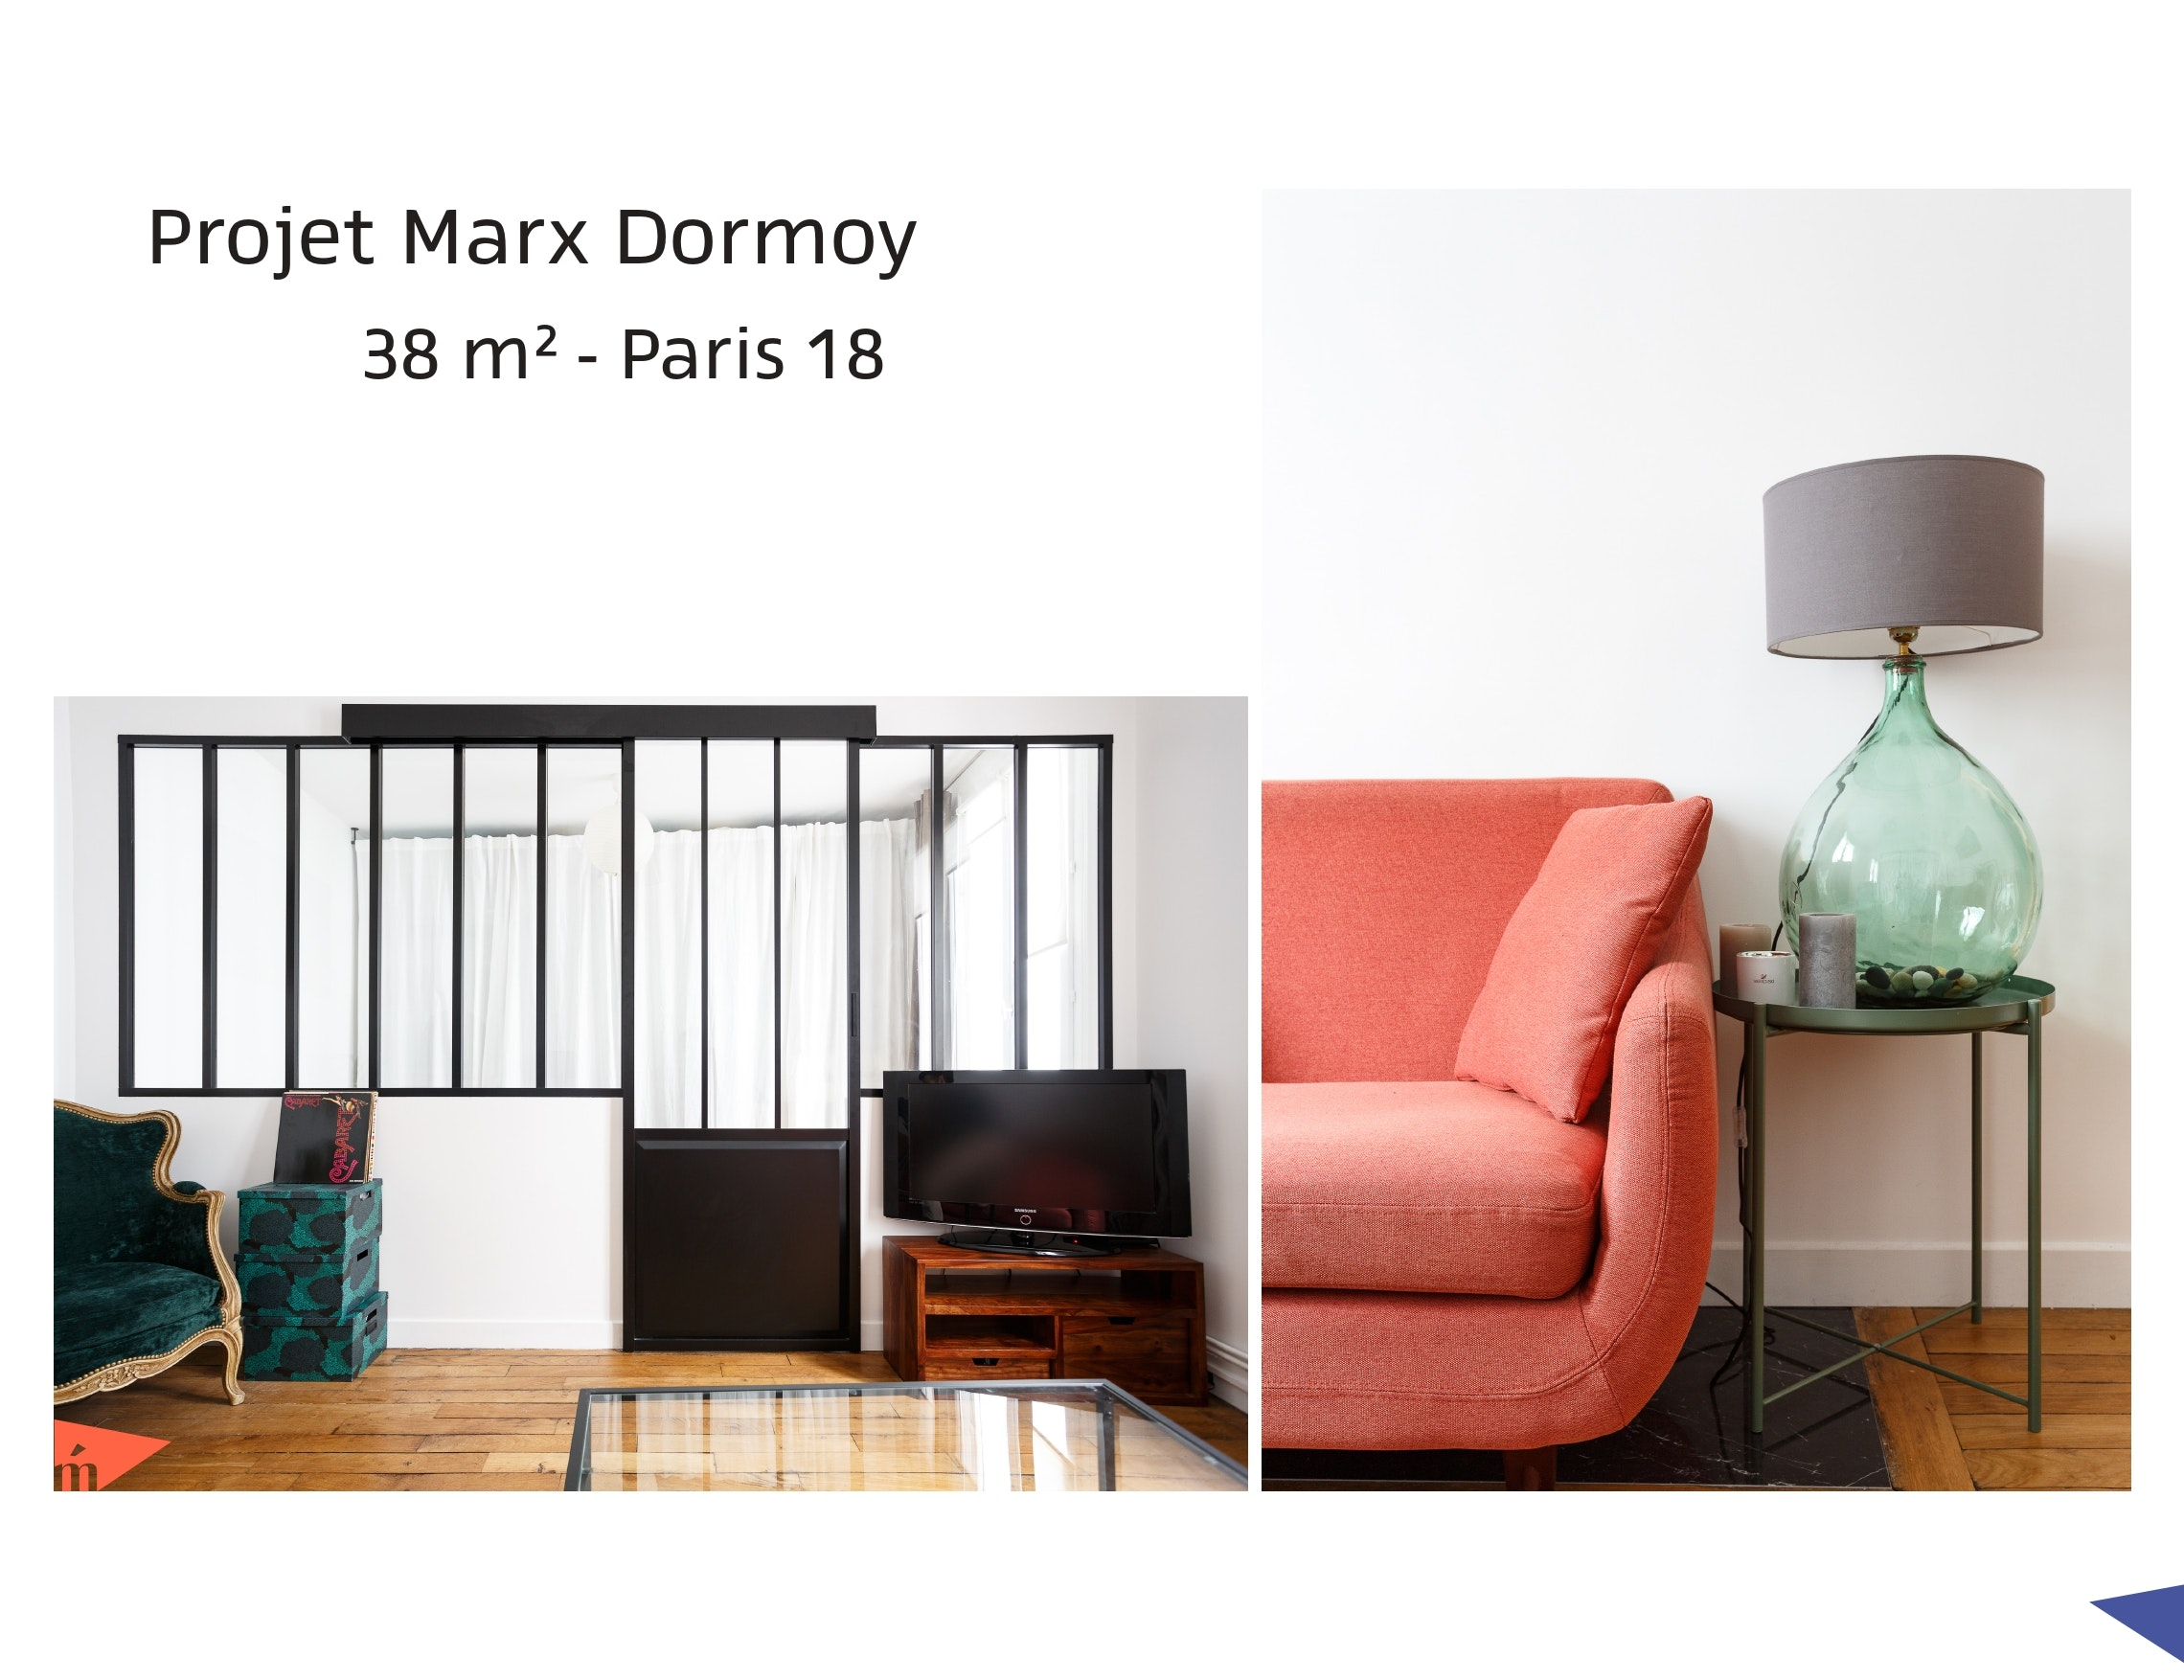 photo Projet Marx Dormoy - 38 m² - Paris 18 Léa Mast - Architecte hemea